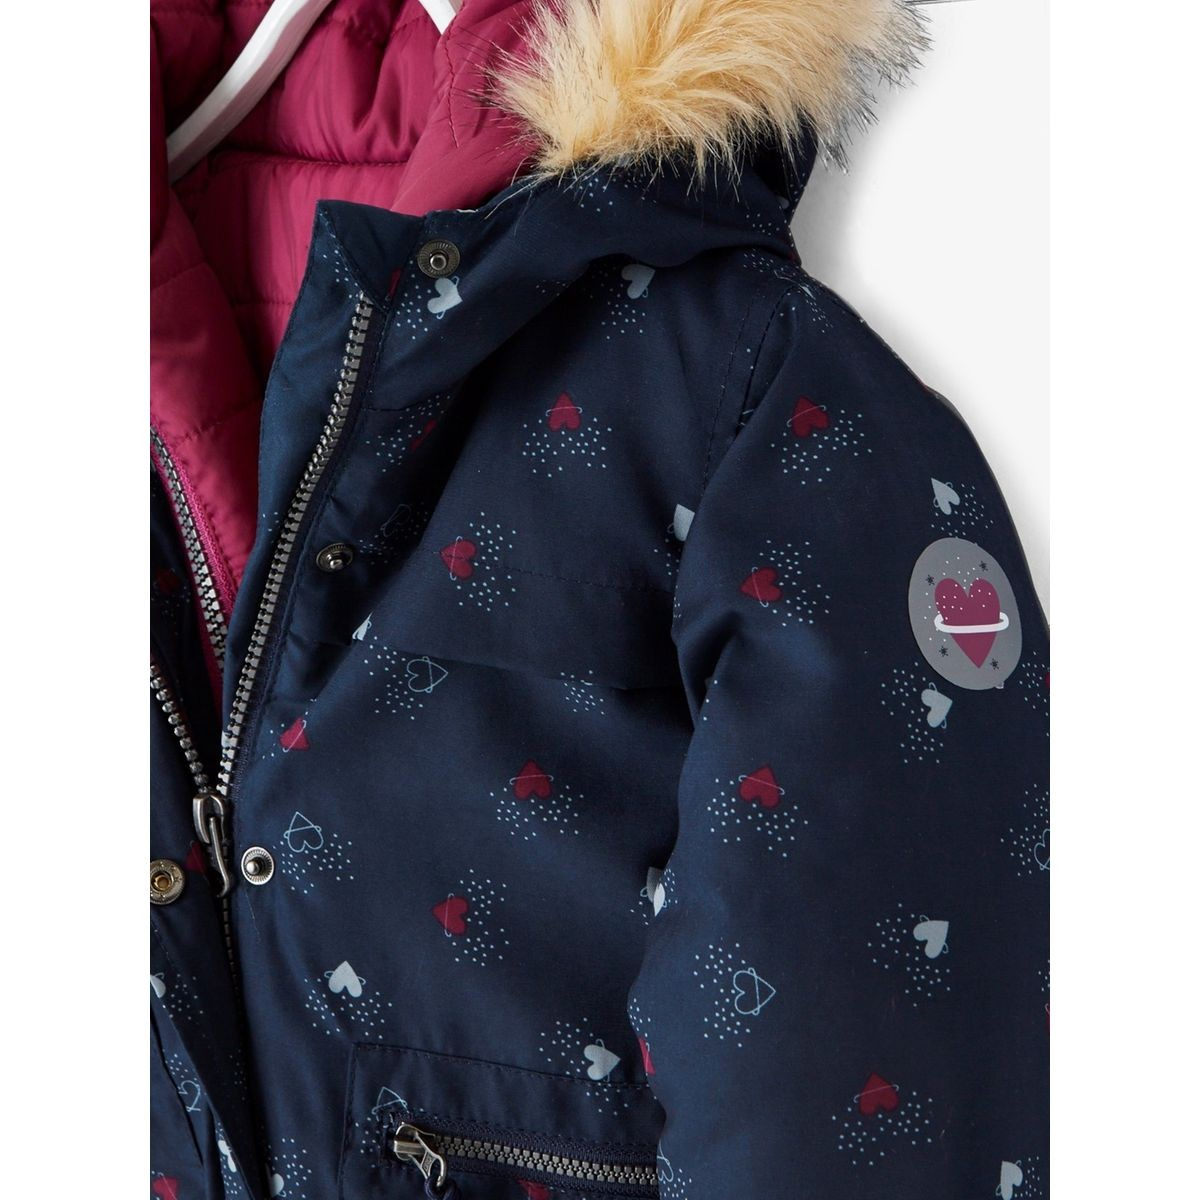 many fashionable shop best sellers 100% authentic Parka fille 3 en 1 doublée polaire | Products | Parka fille ...